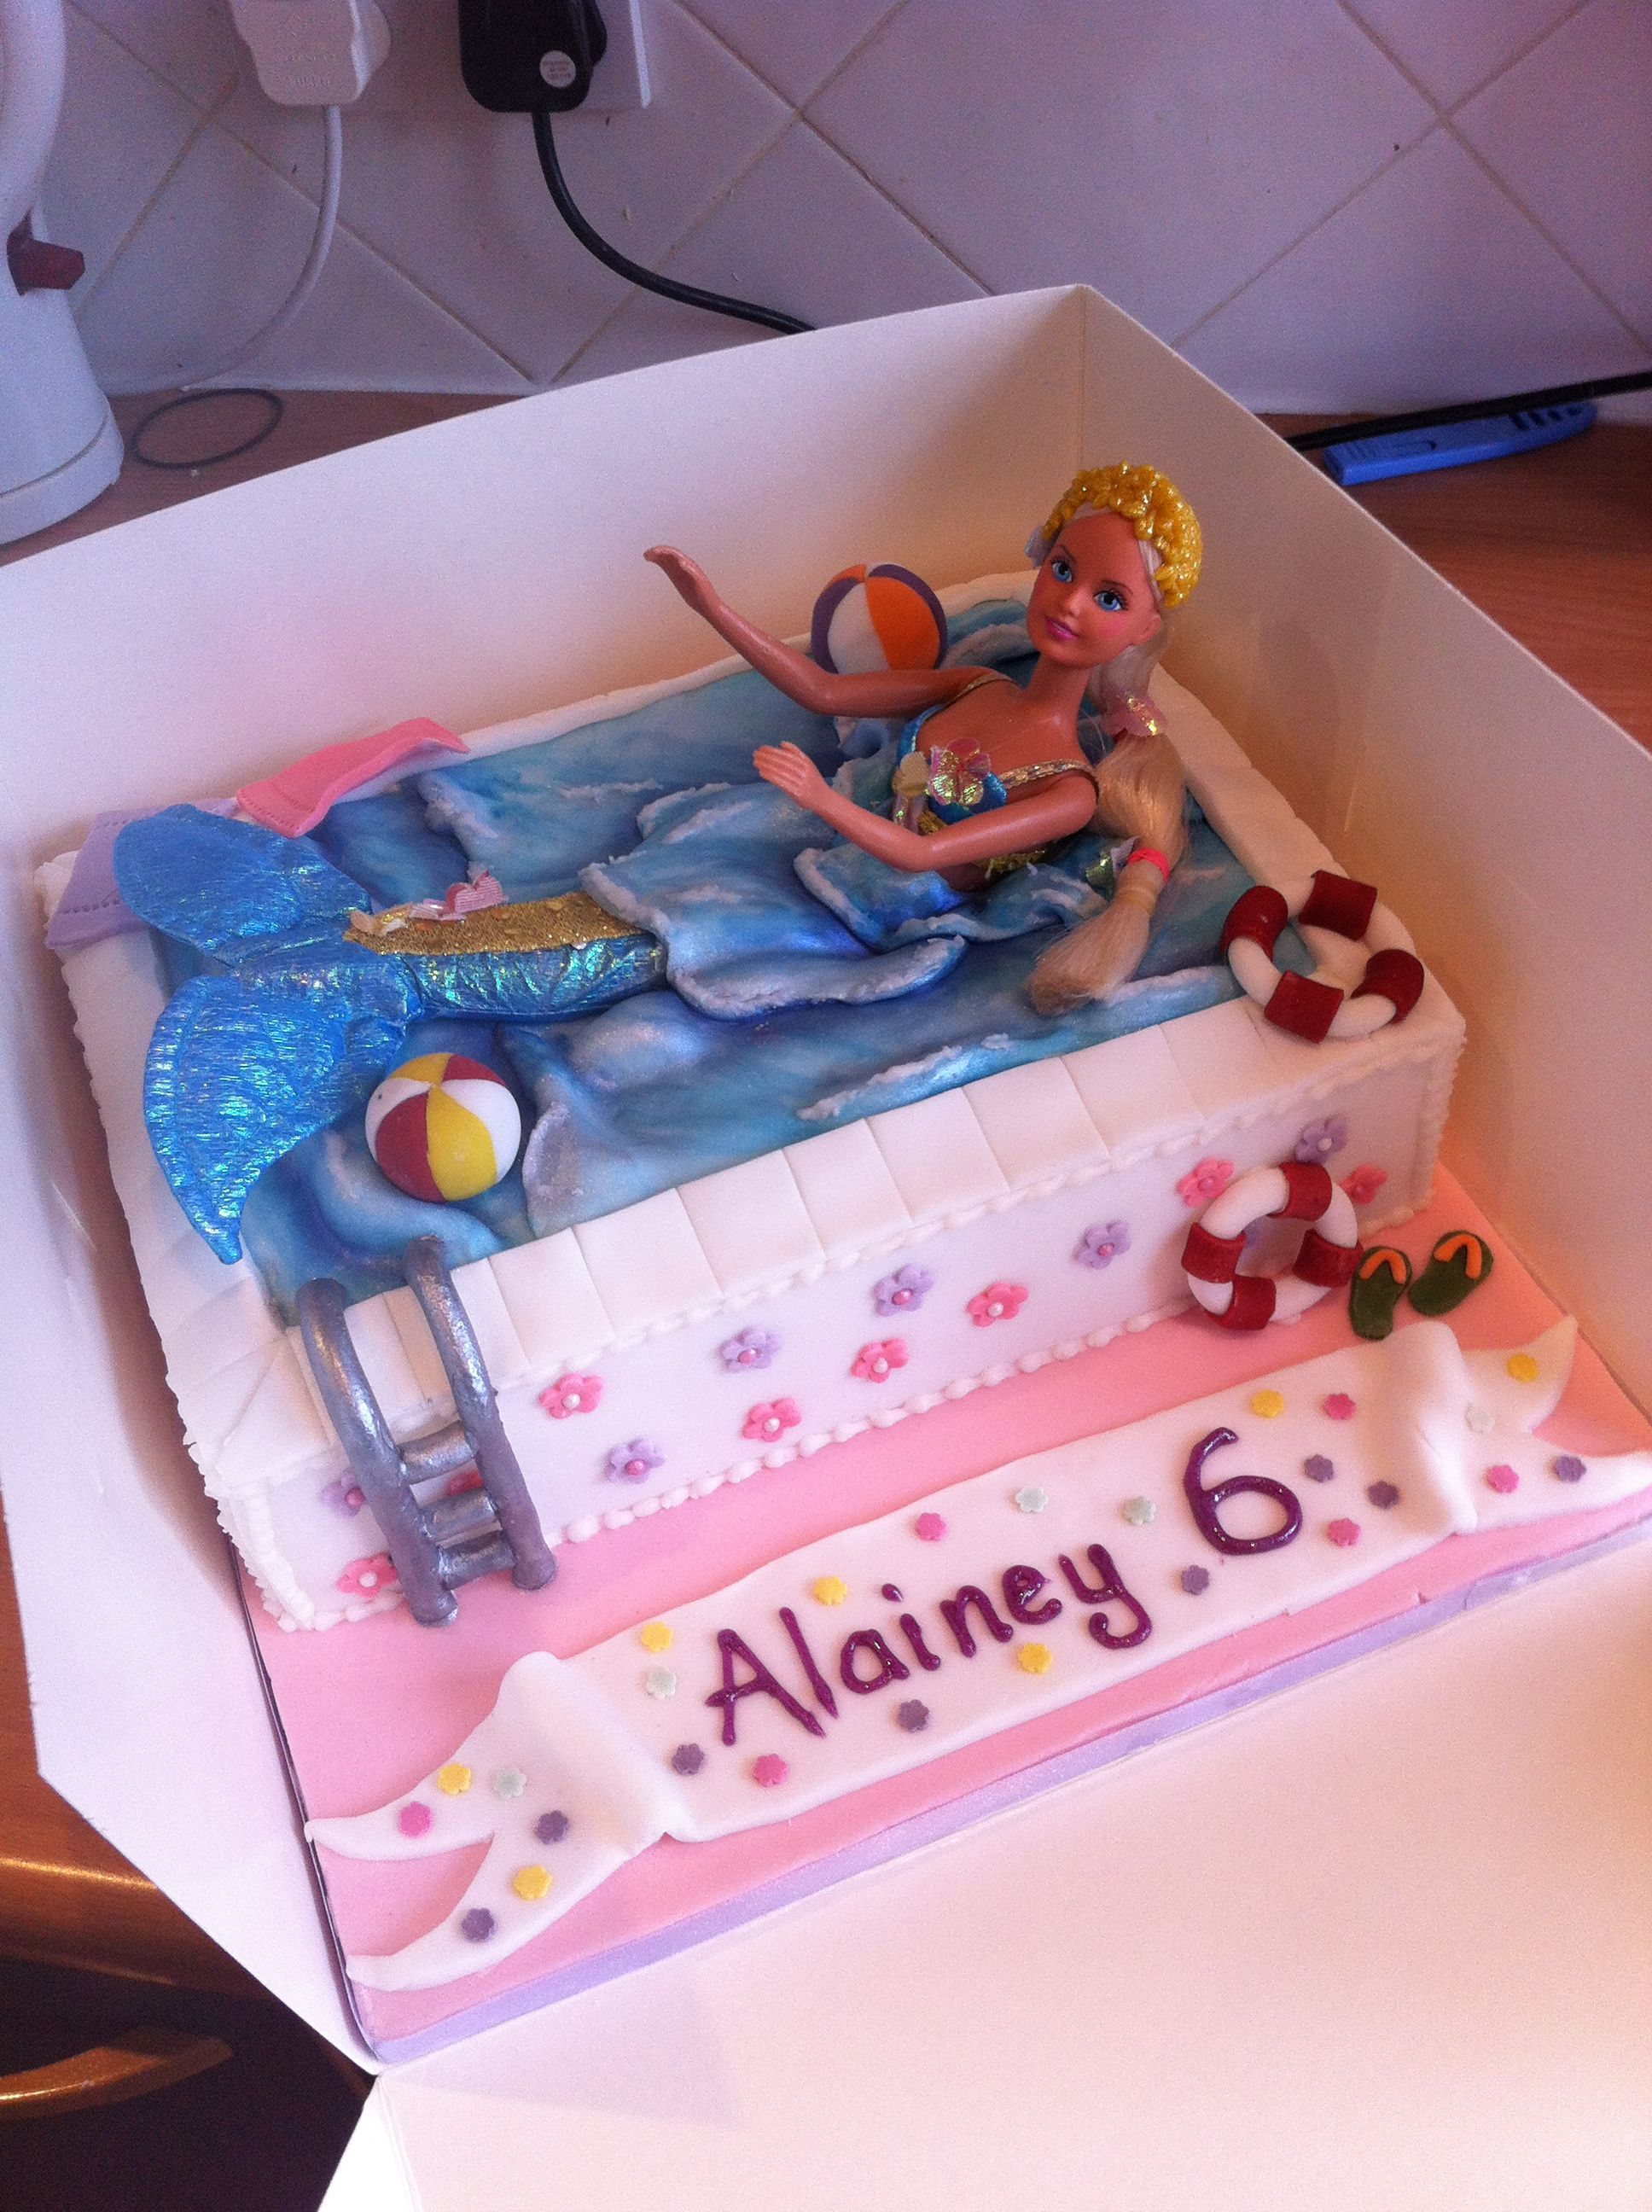 Barbie Swimming Pool Cake Cakes Cupcakes Candy Pinterest Pool Cake Cake And Cake Art